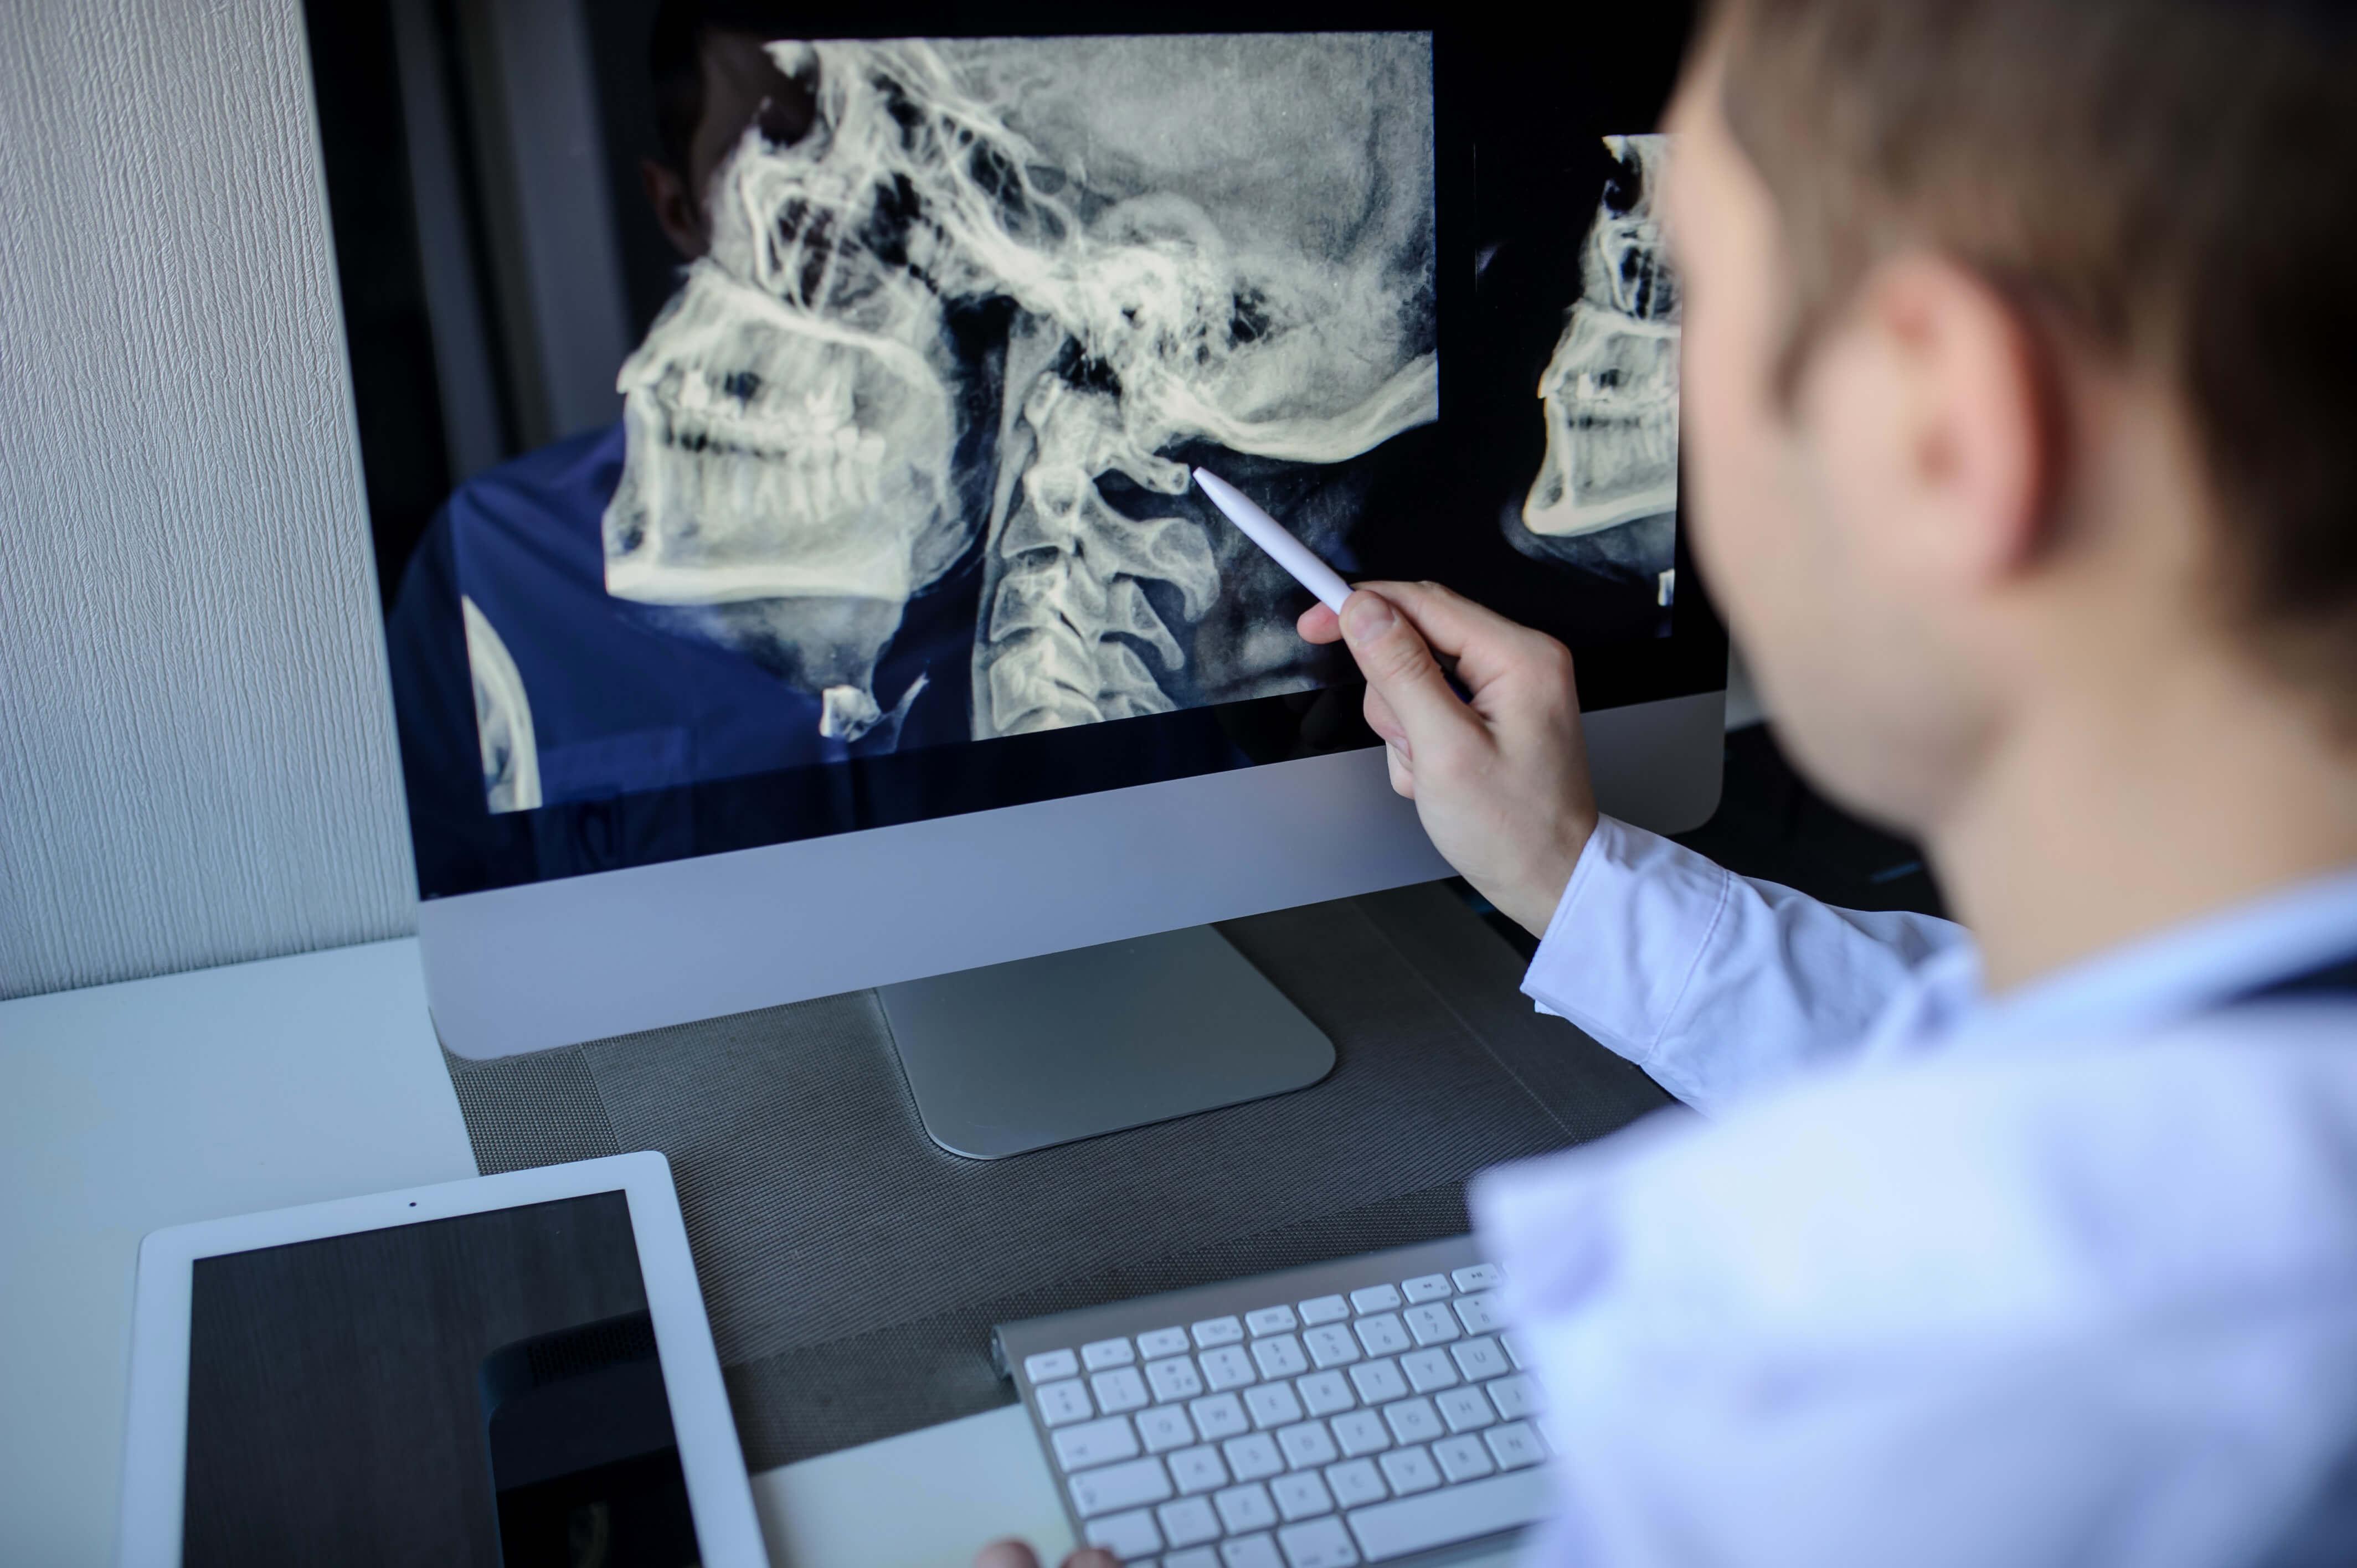 Benefits of Digital X-Rays